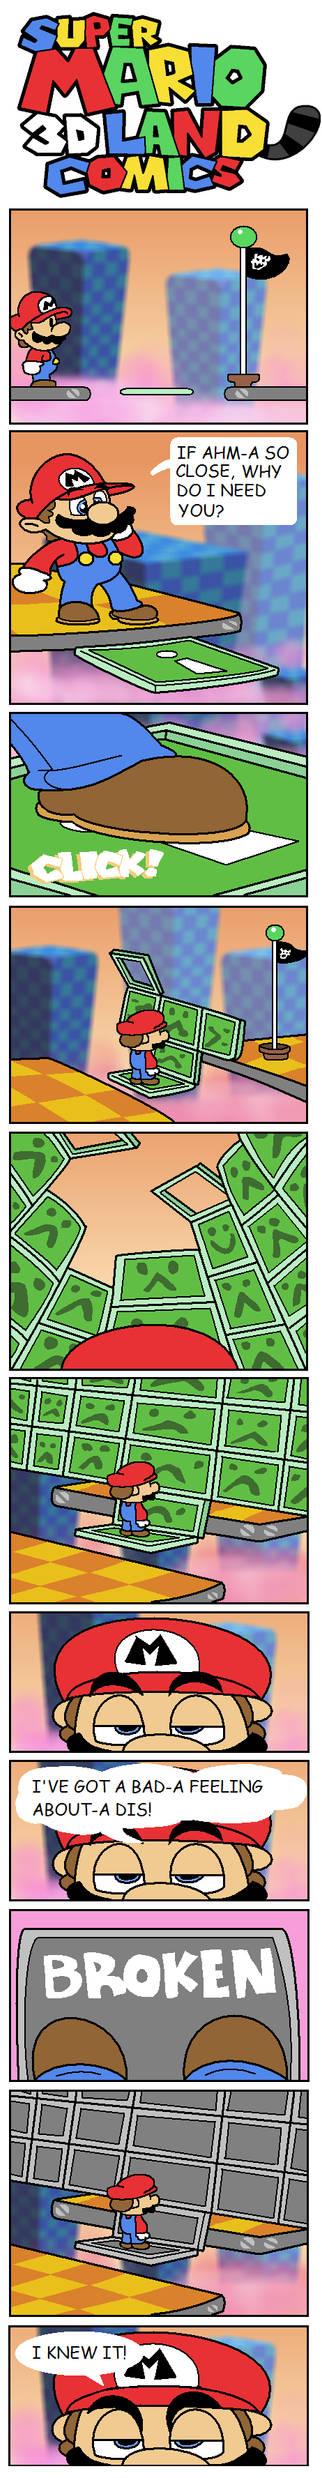 SM 3D Land Comics: Machinery